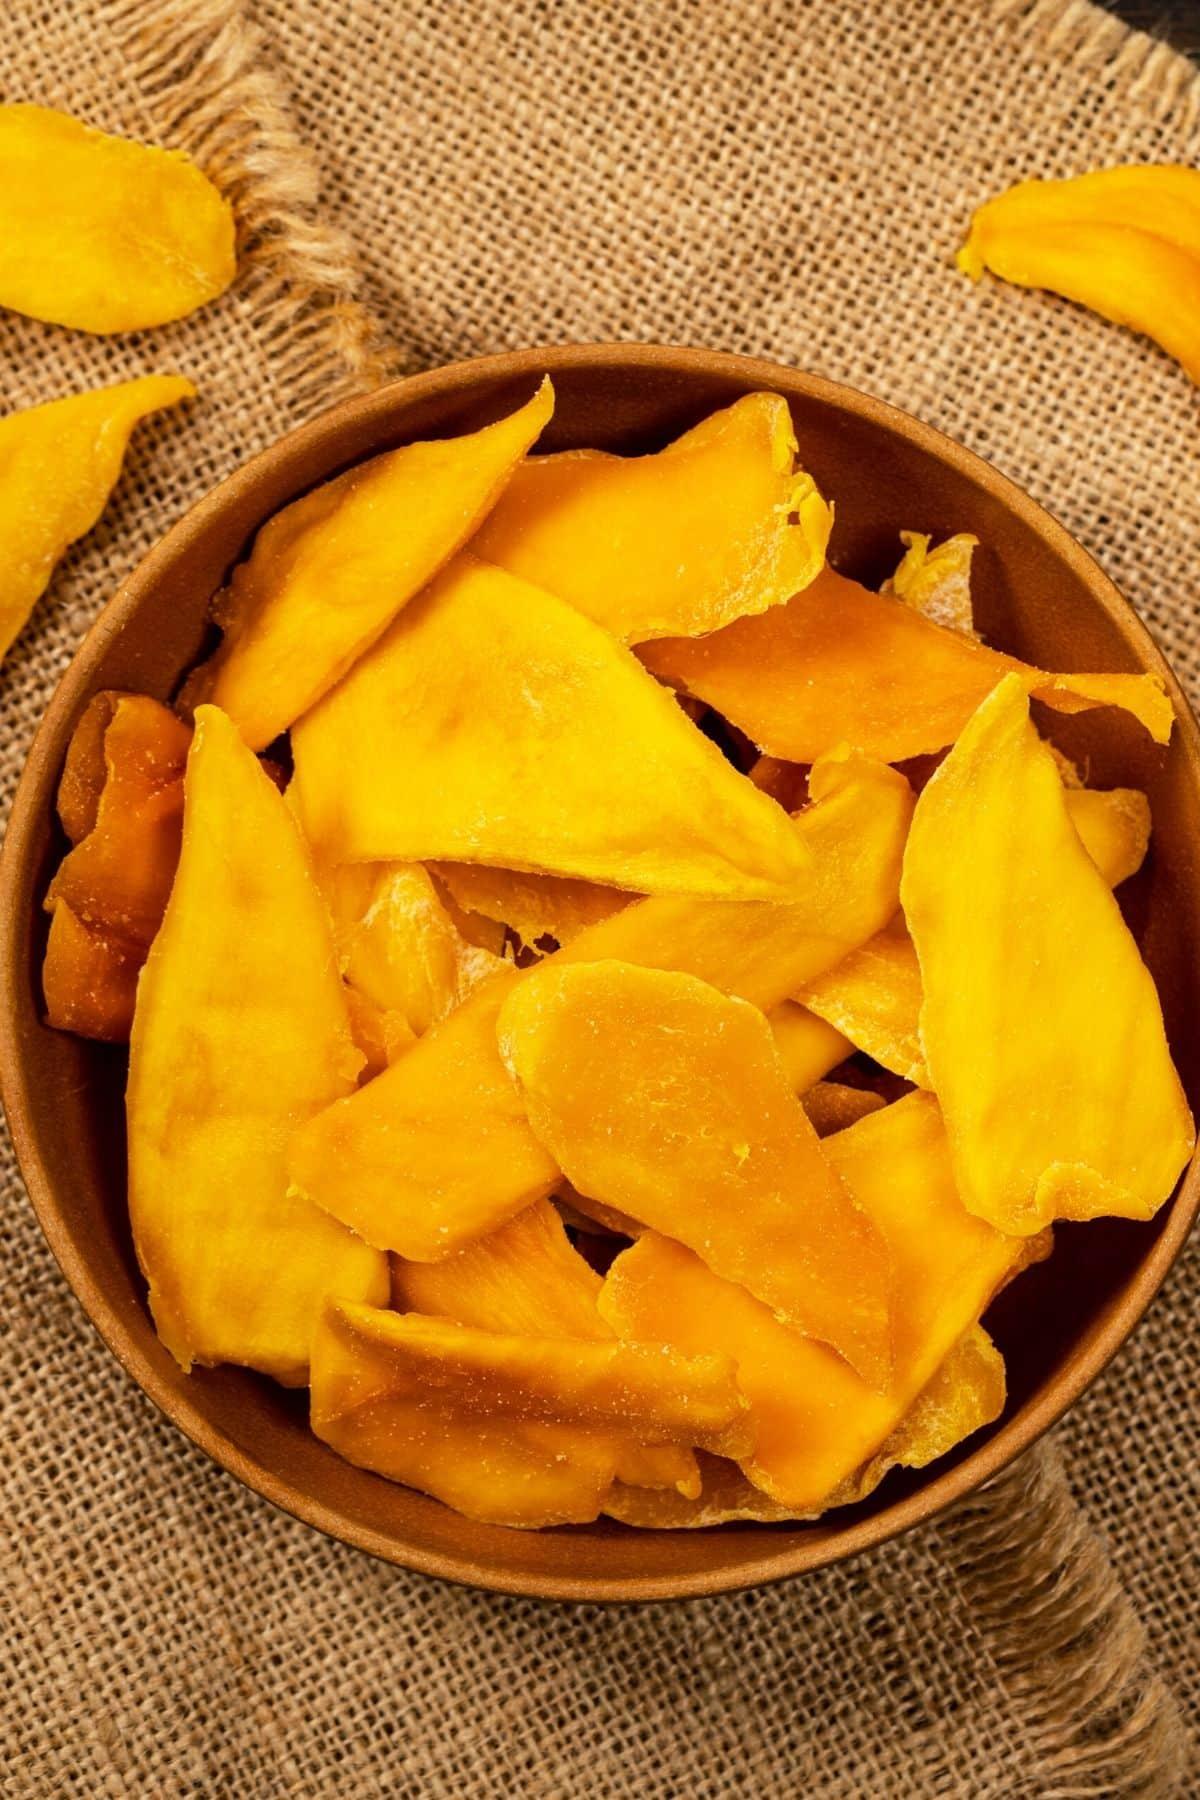 dried mango in a bowl